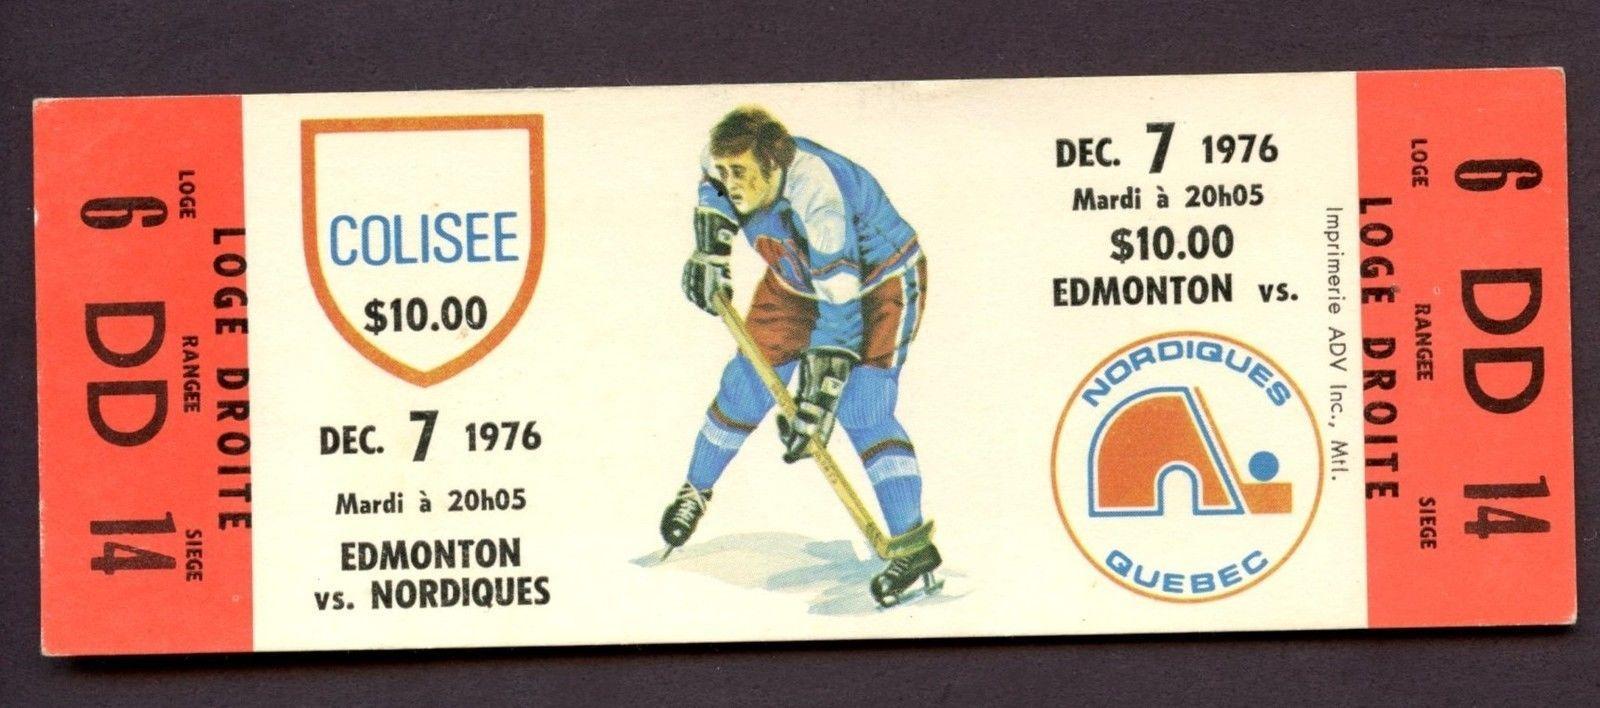 1976 WHA Ticket Stub Edmonton Oilers vs. Quebec Nordiques